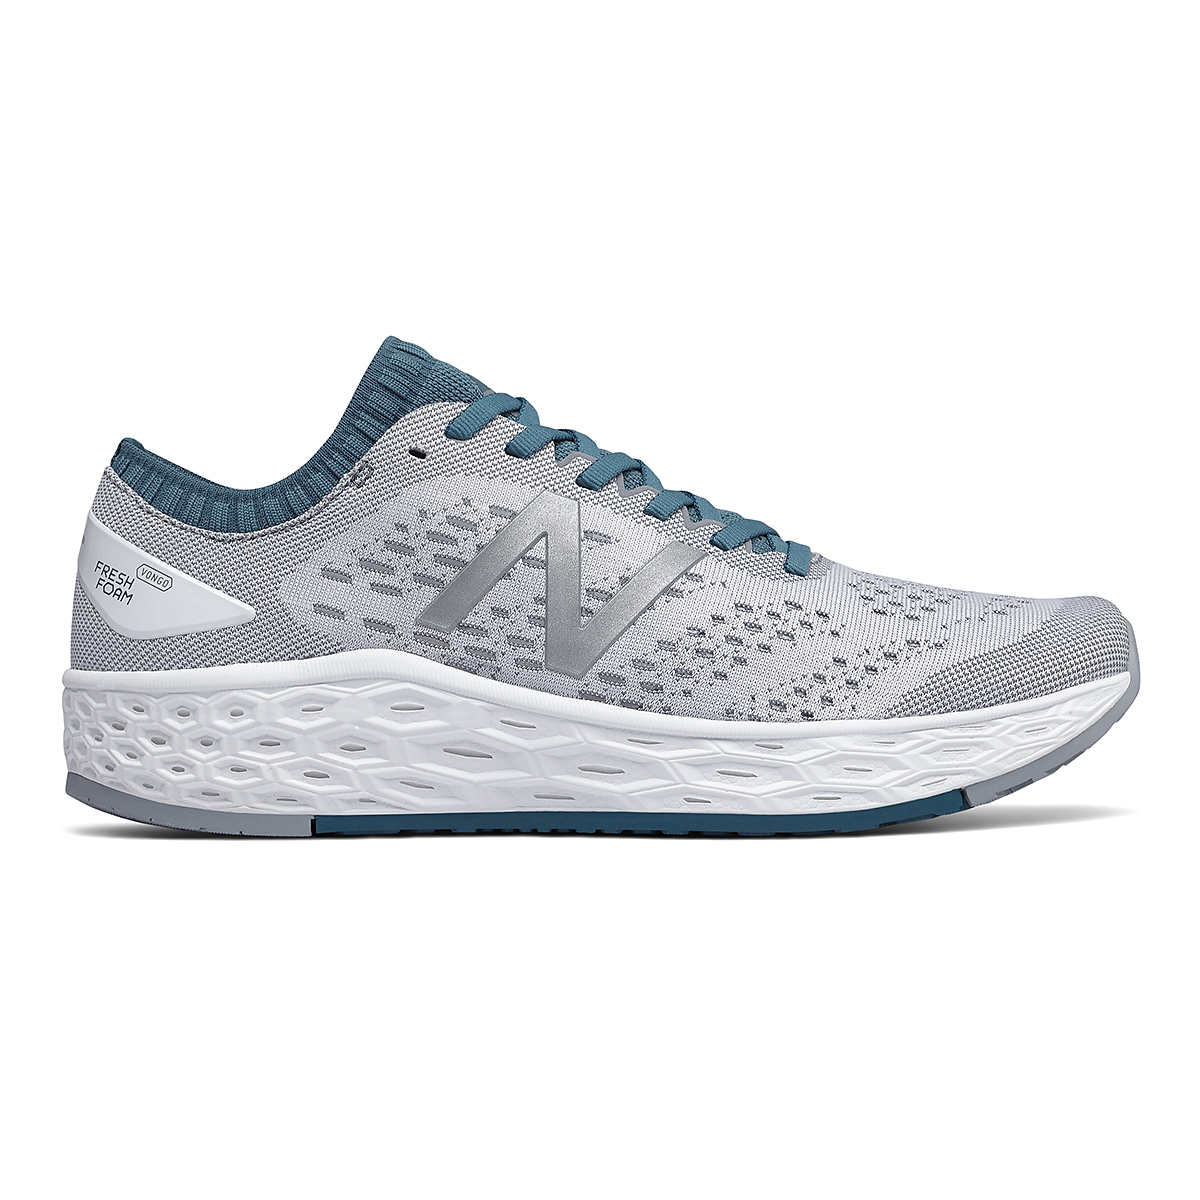 Men's New Balance Vongo V4 Running Shoe - Color: White - Size: 8 - Width: Regular, White, large, image 1